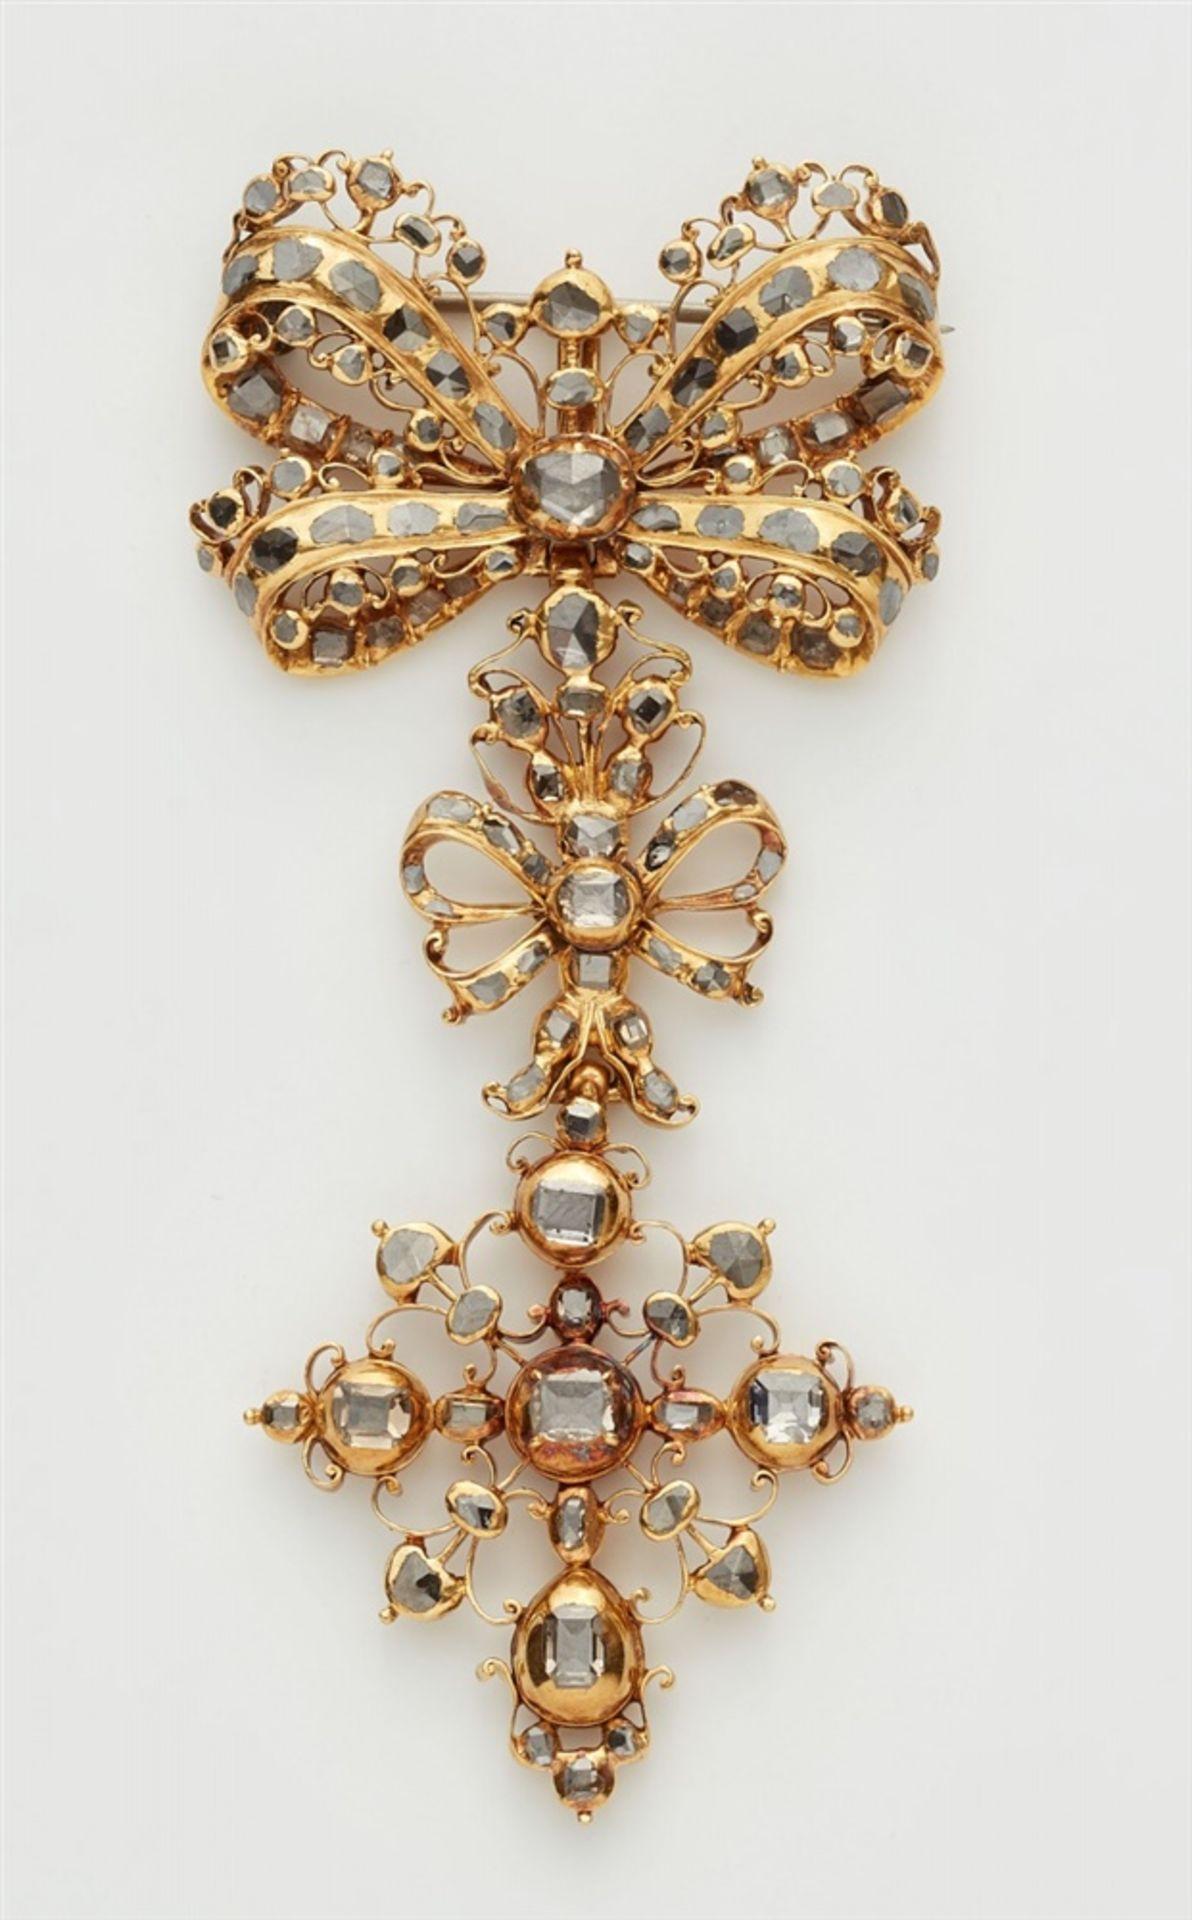 Anhängerbrosche mit Tafeldiamanten